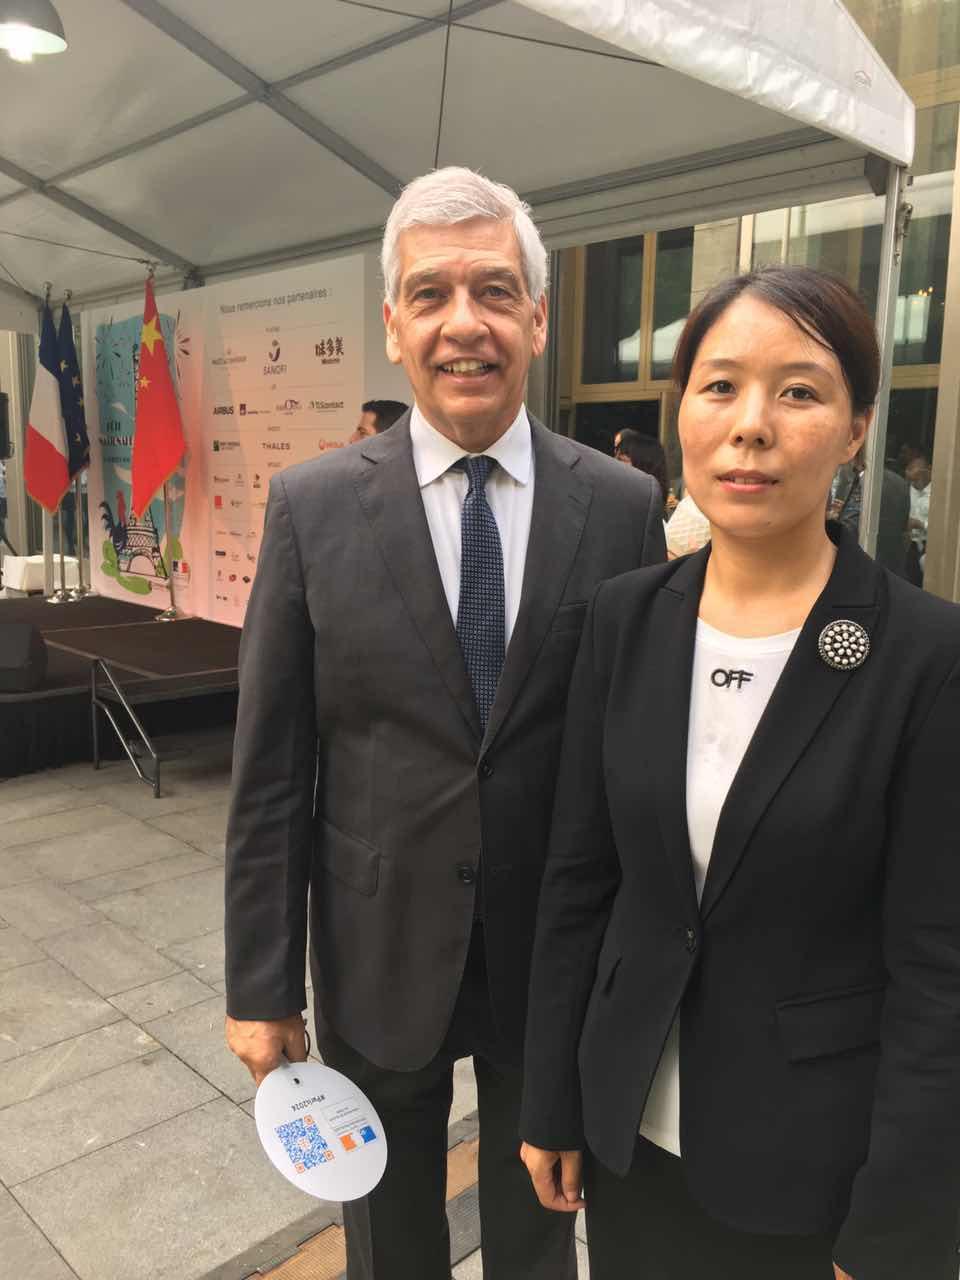 Brazilian Ambassador to China H.E. Mr. Marcos Caramuru de Paiva and Secretary General Cui Jianghong